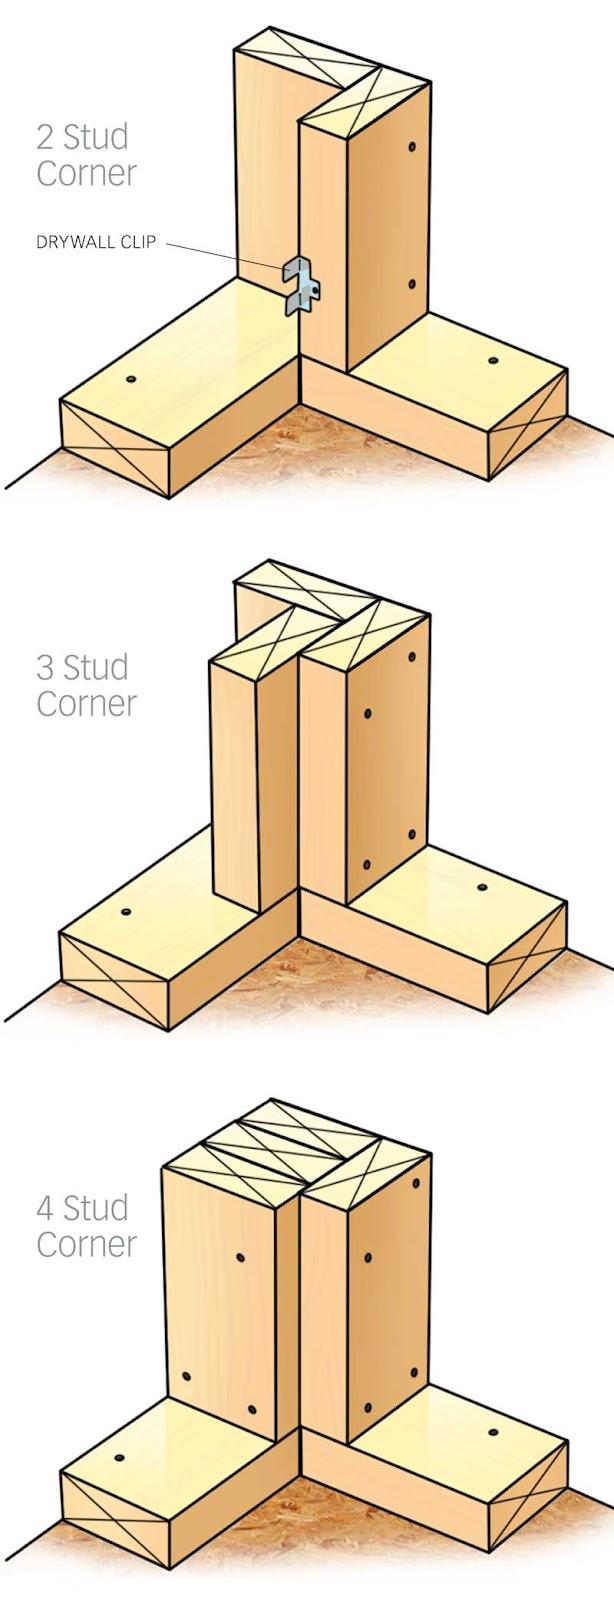 2x6 Wall Construction : Wall framing detail related keywords